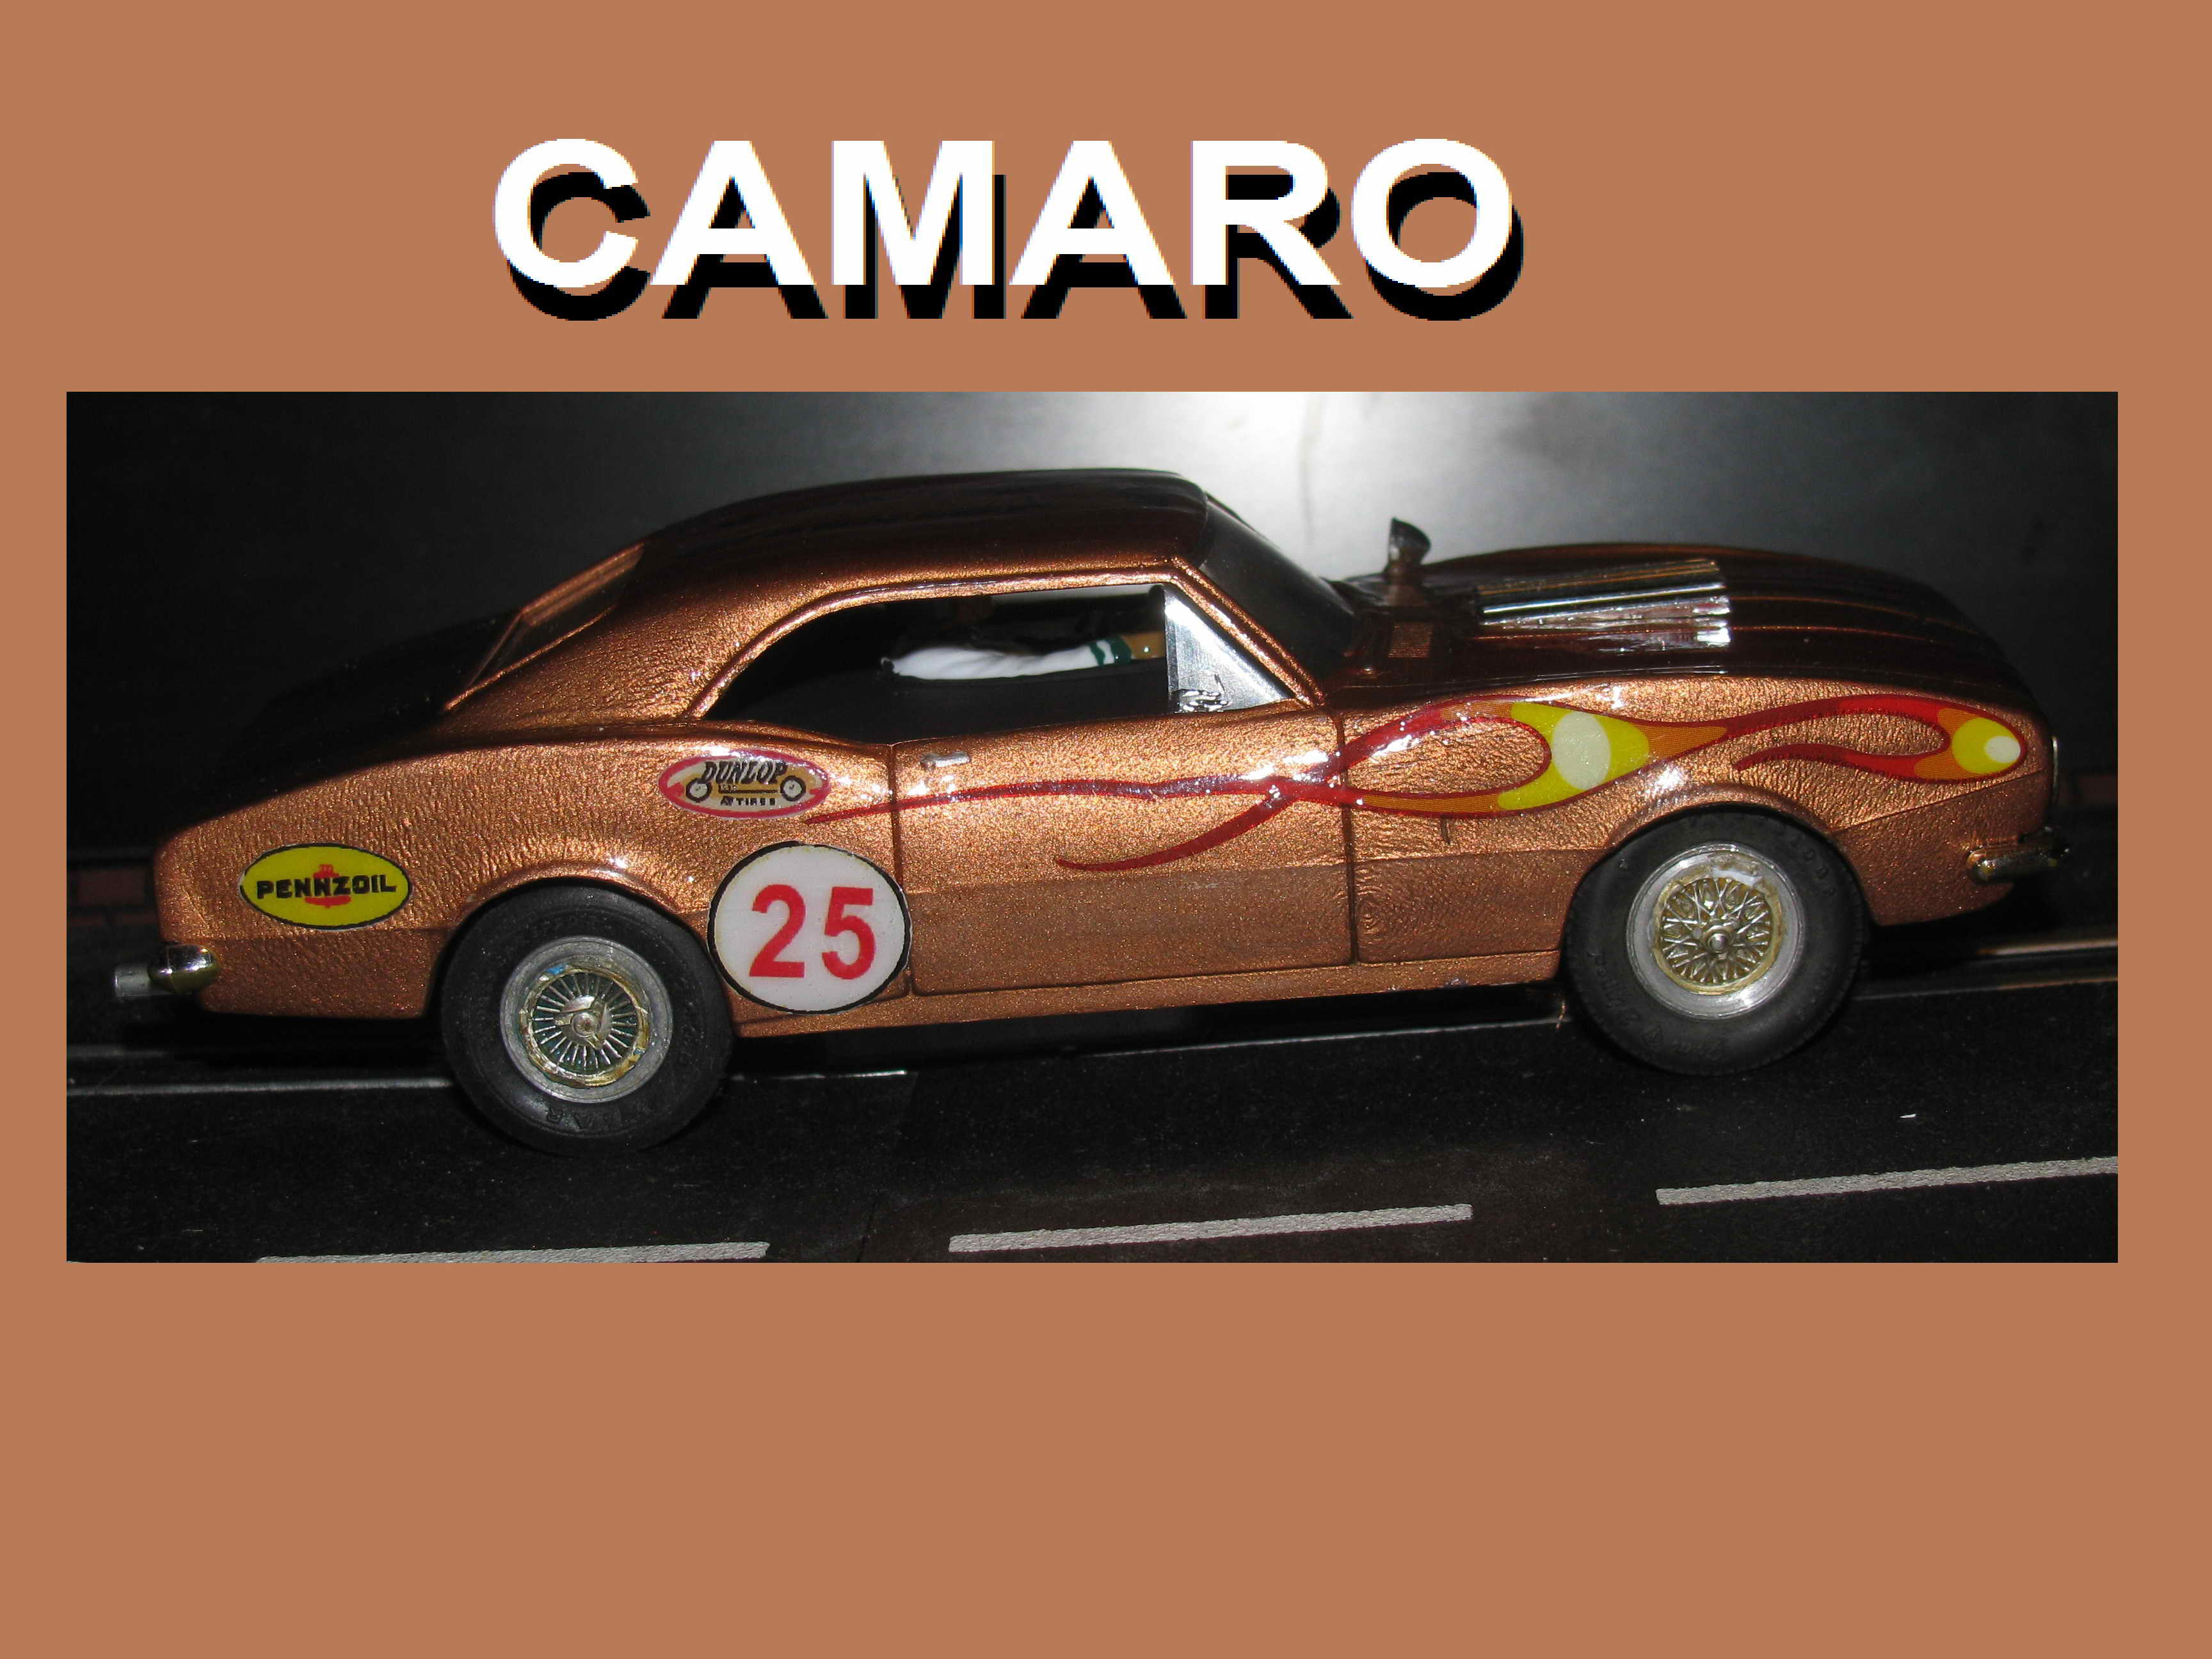 Vintage 1967 Chevy Camaro Eldon Slot Car 1/32 Scale